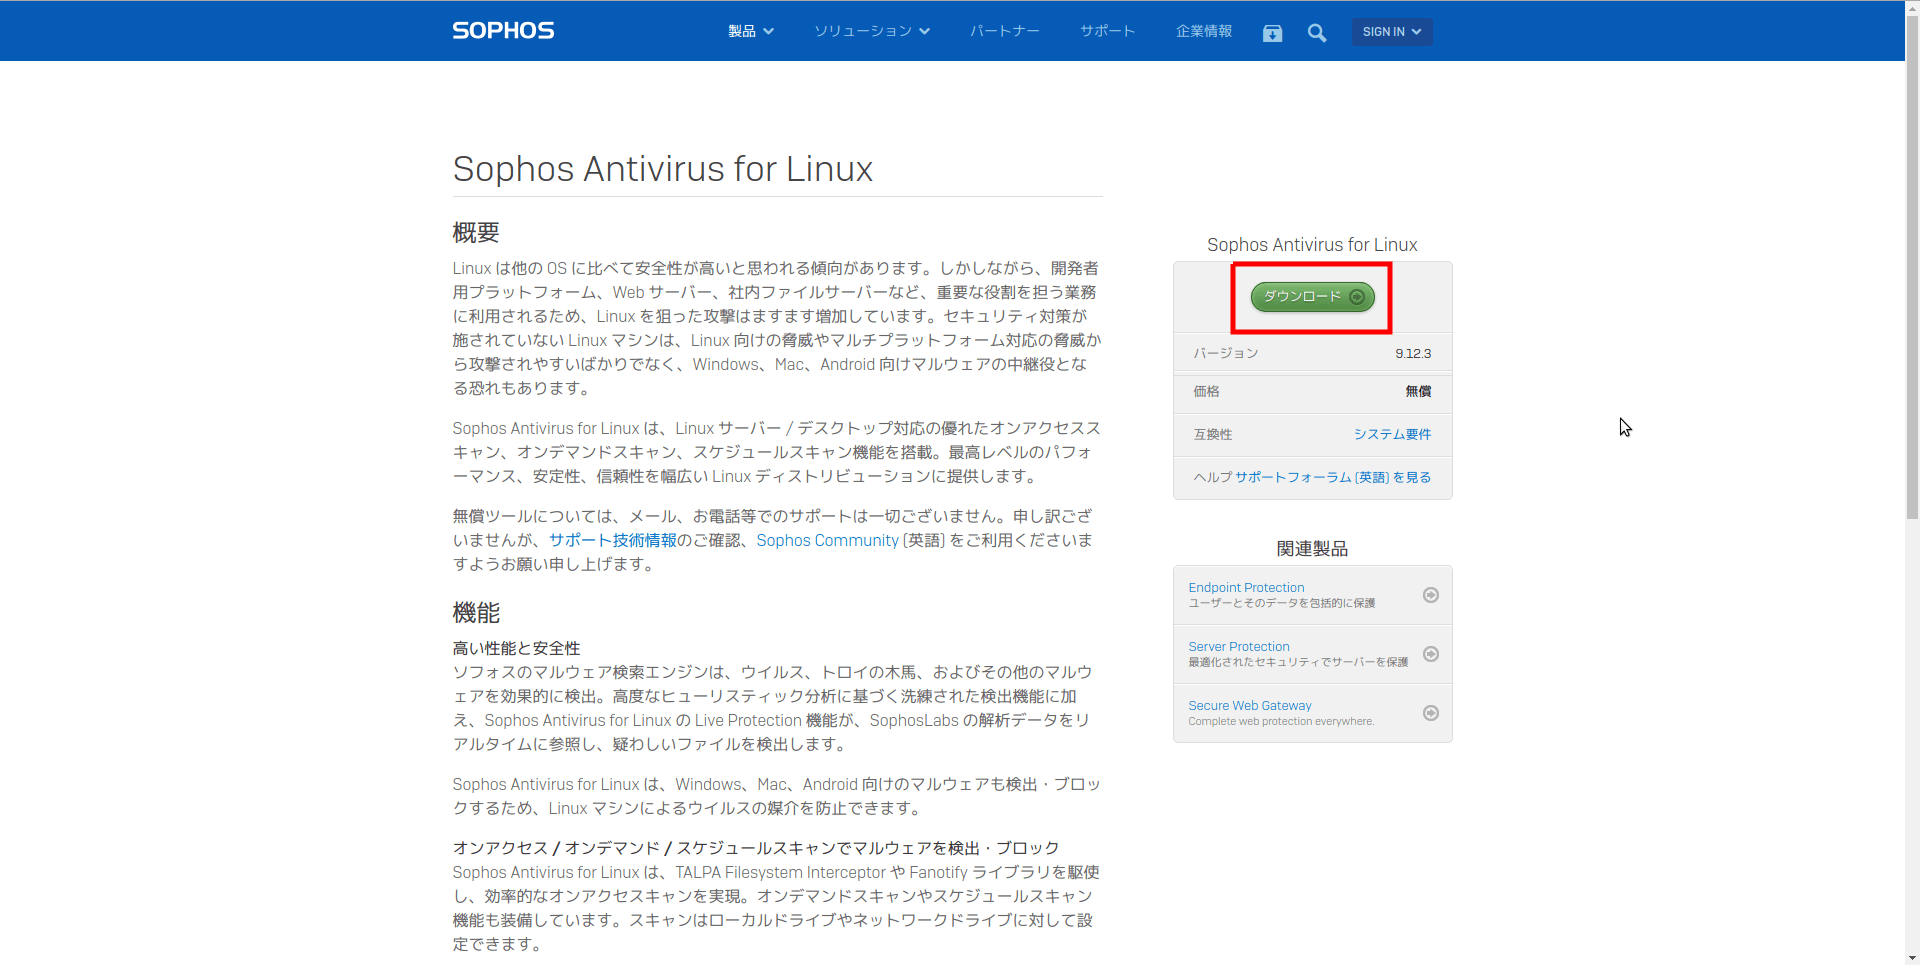 [Linuxウィルス対策]Sophos Antivirus for Linux のインストール方法